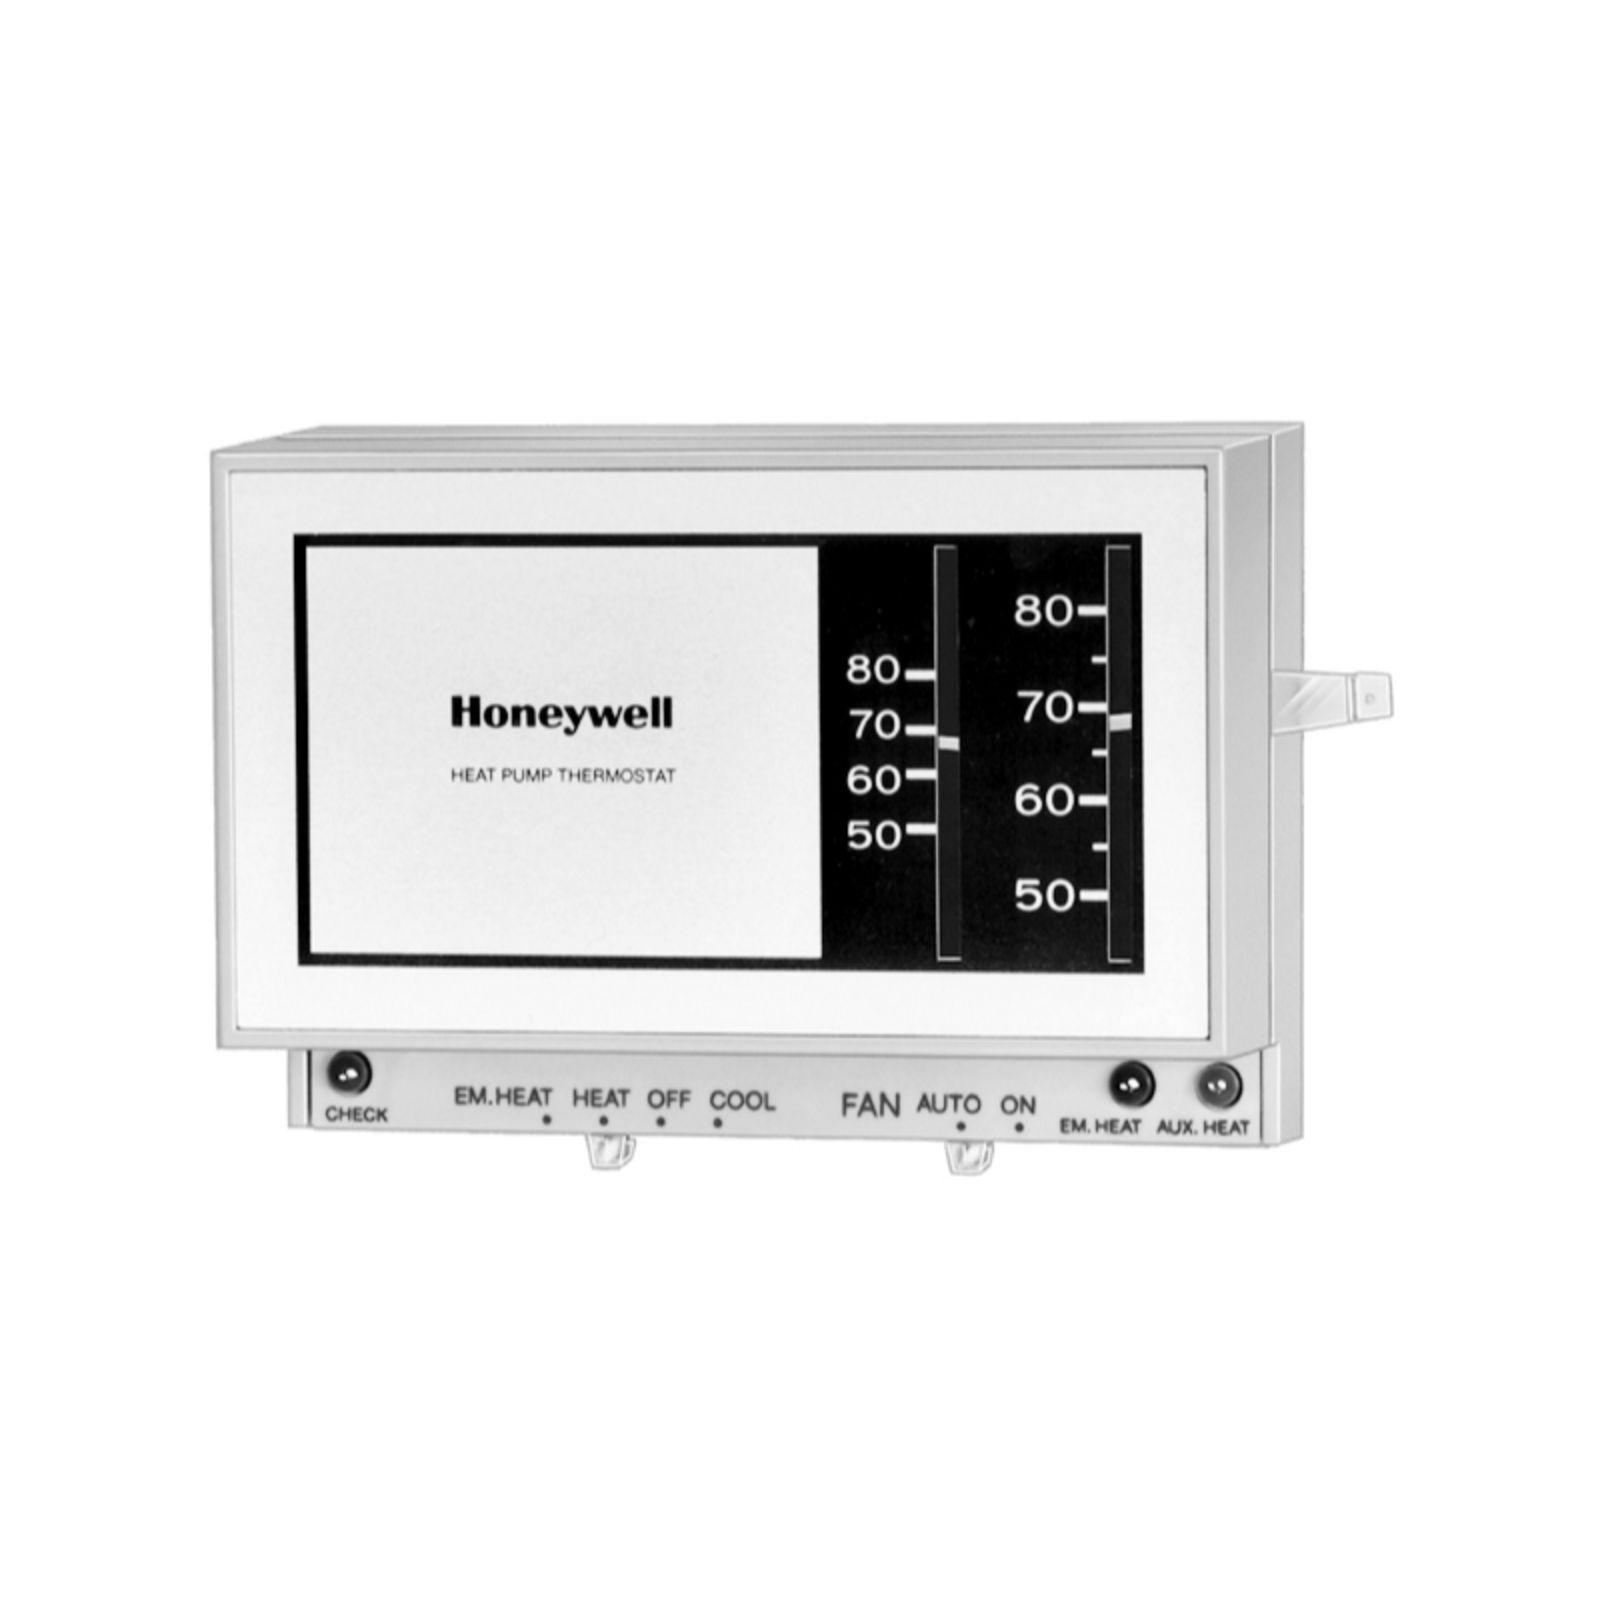 Manual thermostat ac economy heat cool simple analog basic.